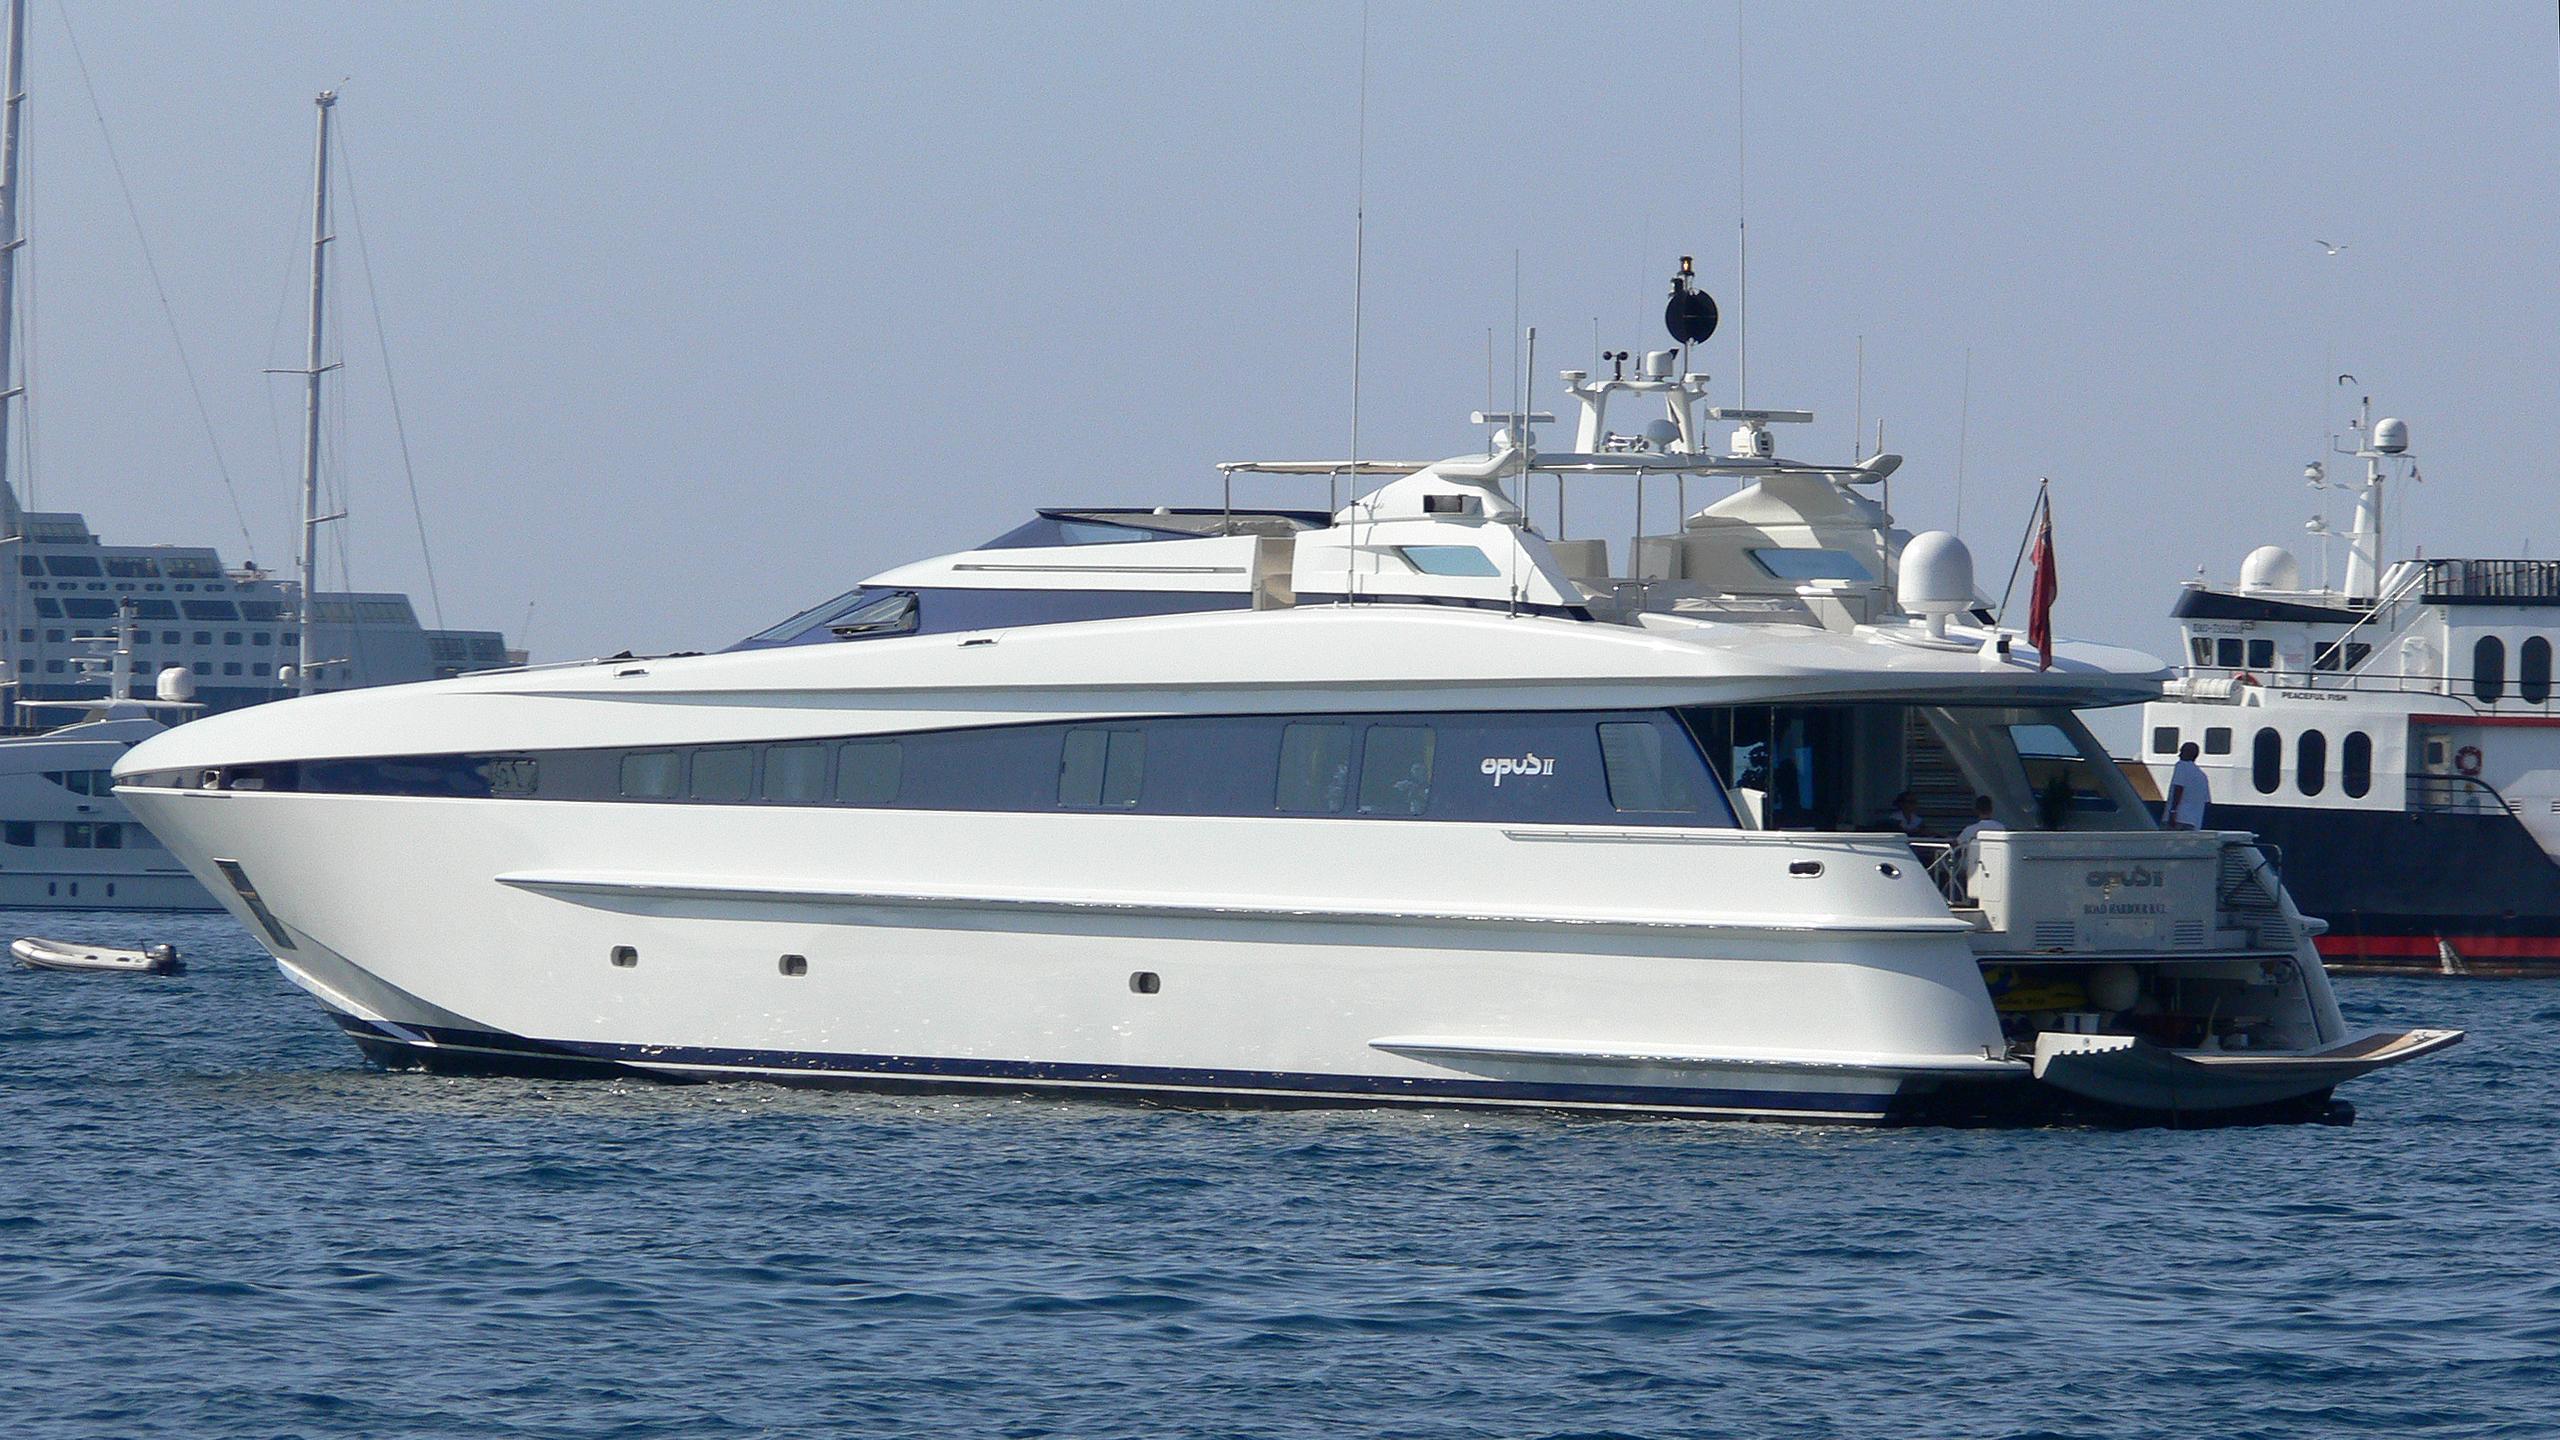 opus-ii-yacht-exterior